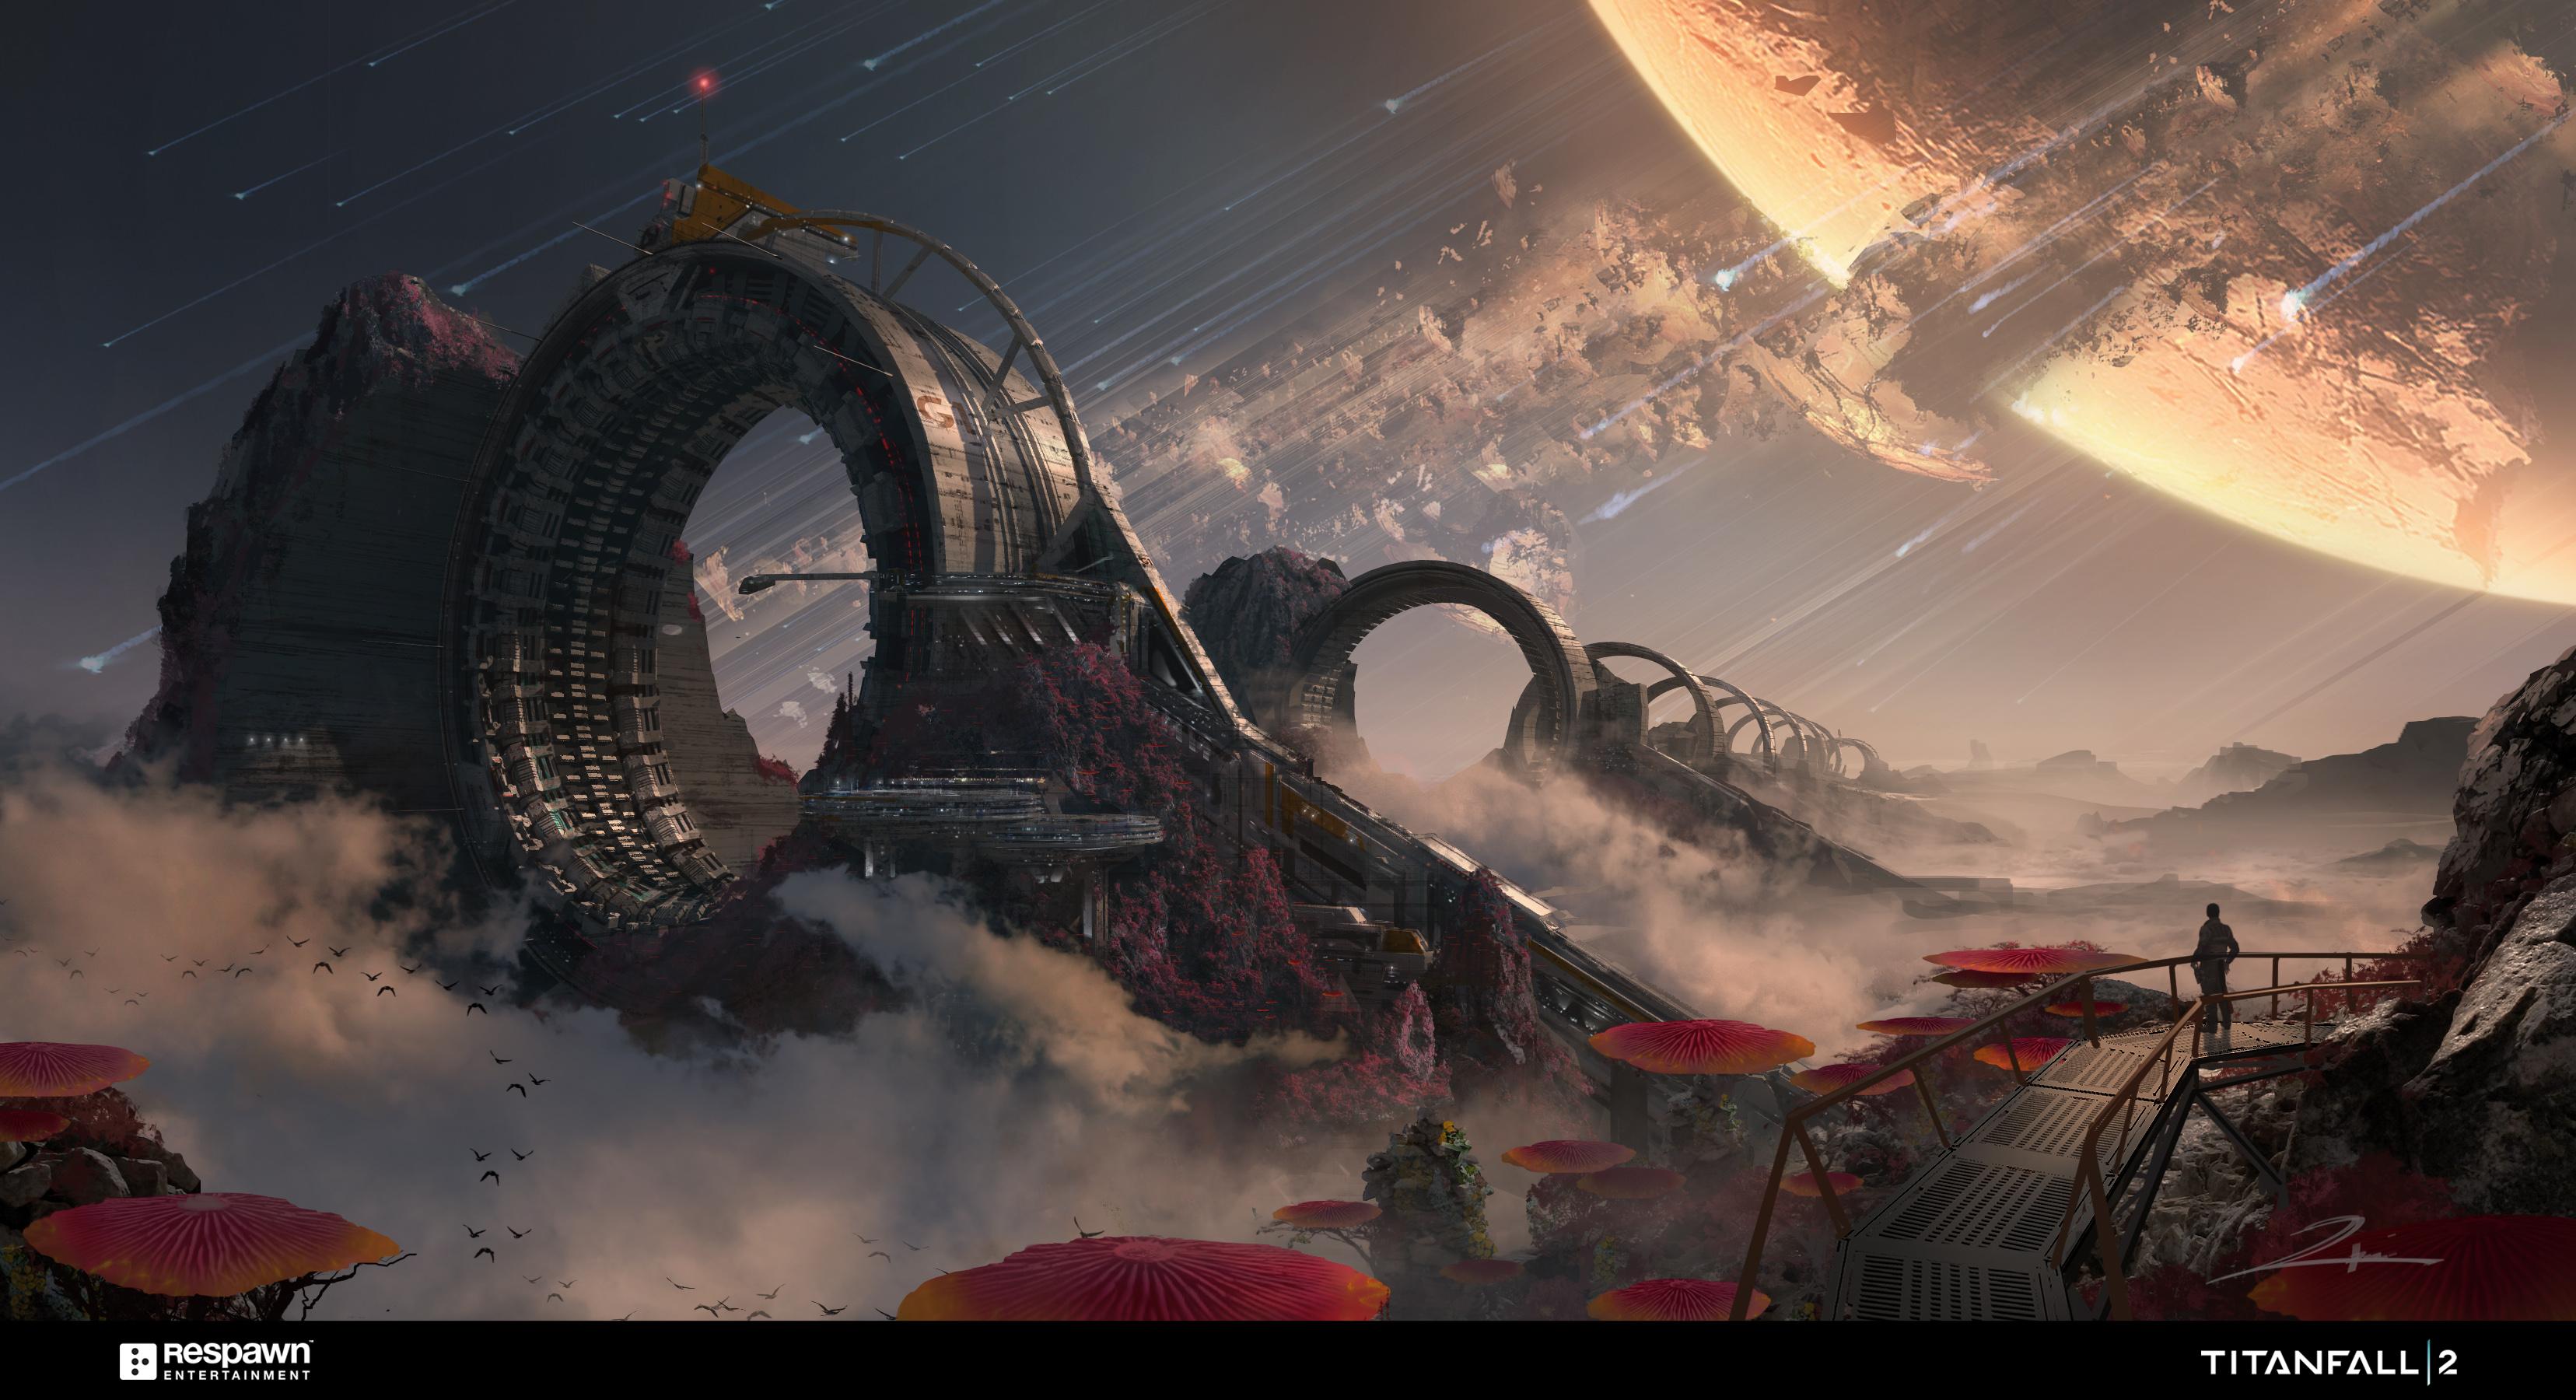 General 3312x1800 video games Titanfall 2 artwork fantasy art science fiction Titanfall futuristic mech